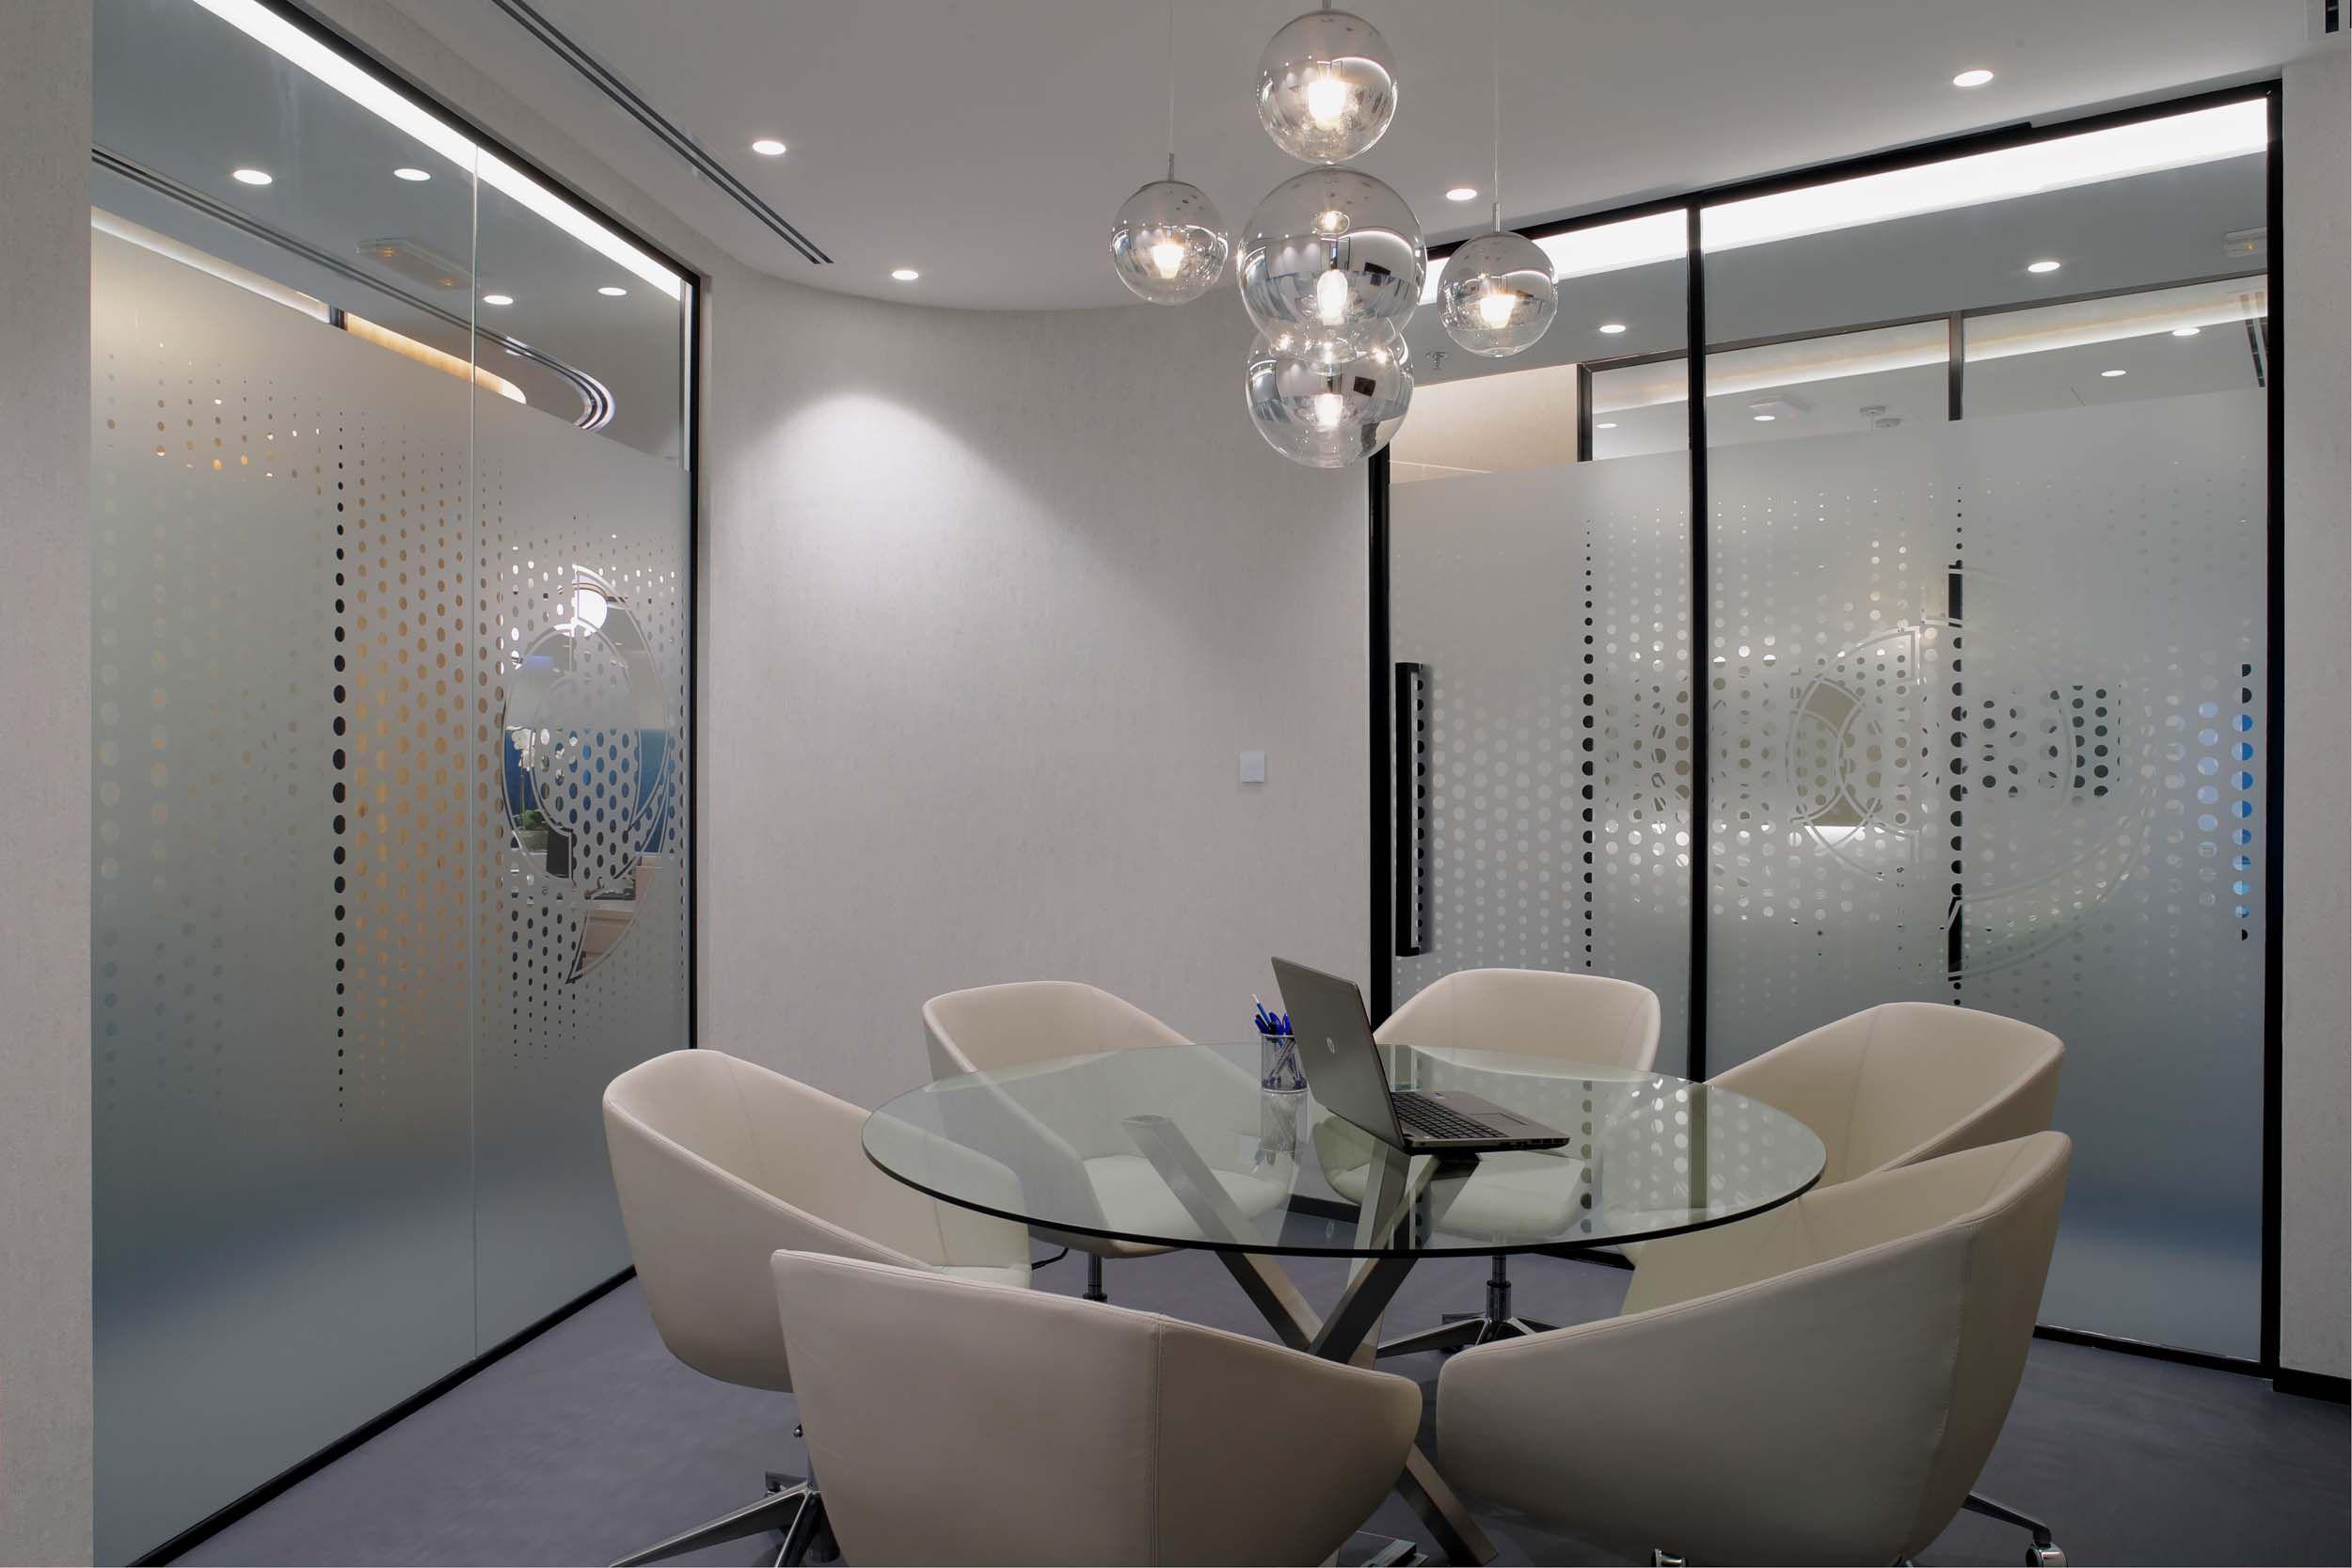 Swiss Bureau Interior Design Amana Capital fice